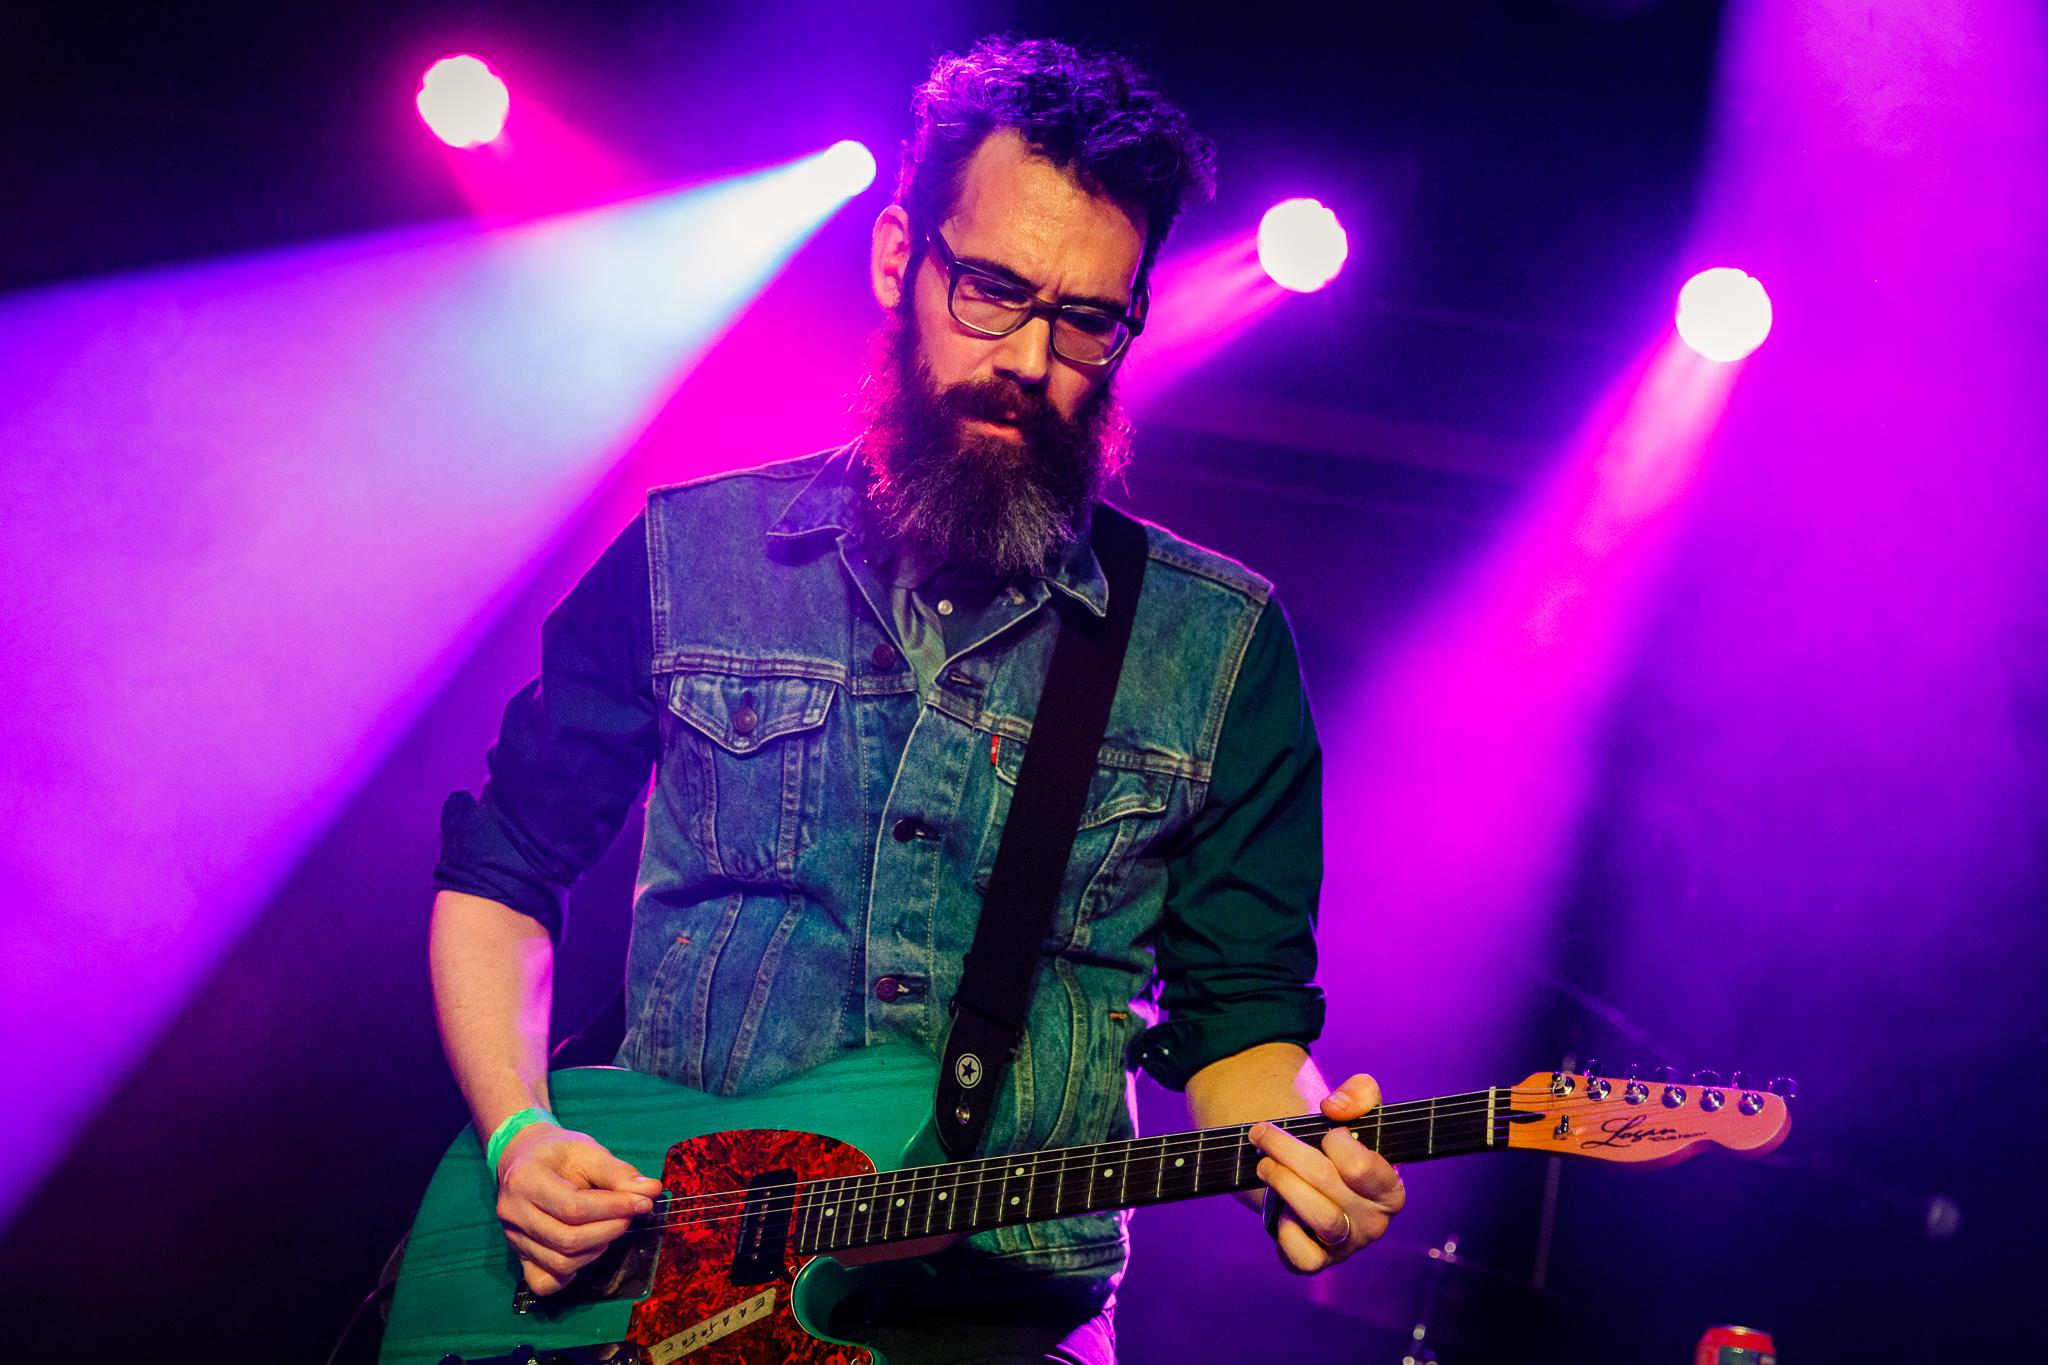 Mock Identity performing at Union Stage in Washington, DC - 3/20/2018 (photo by Matt Condon / @arcane93)